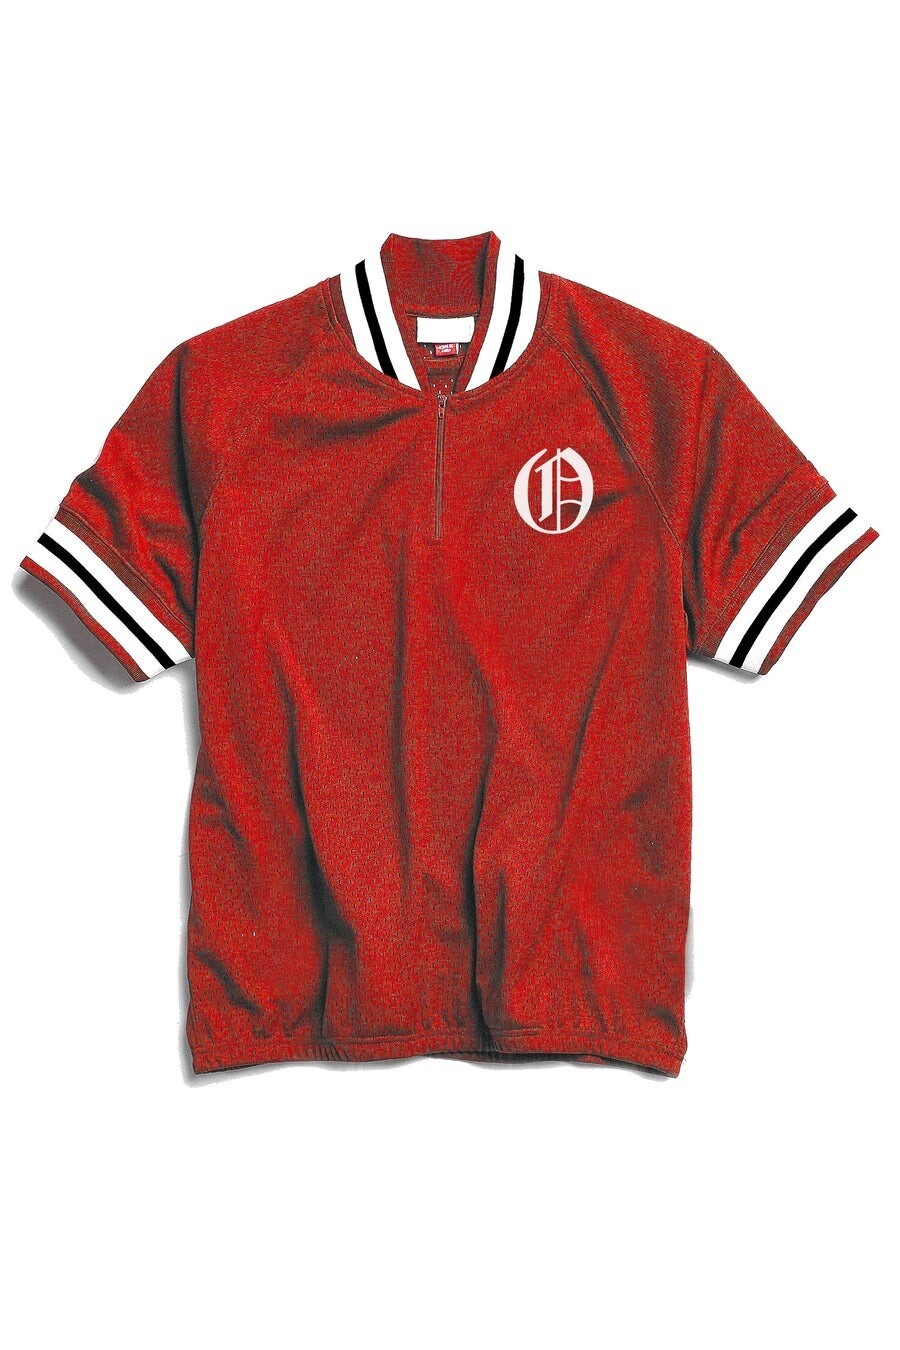 ONLYONE - Red Zip Jersey